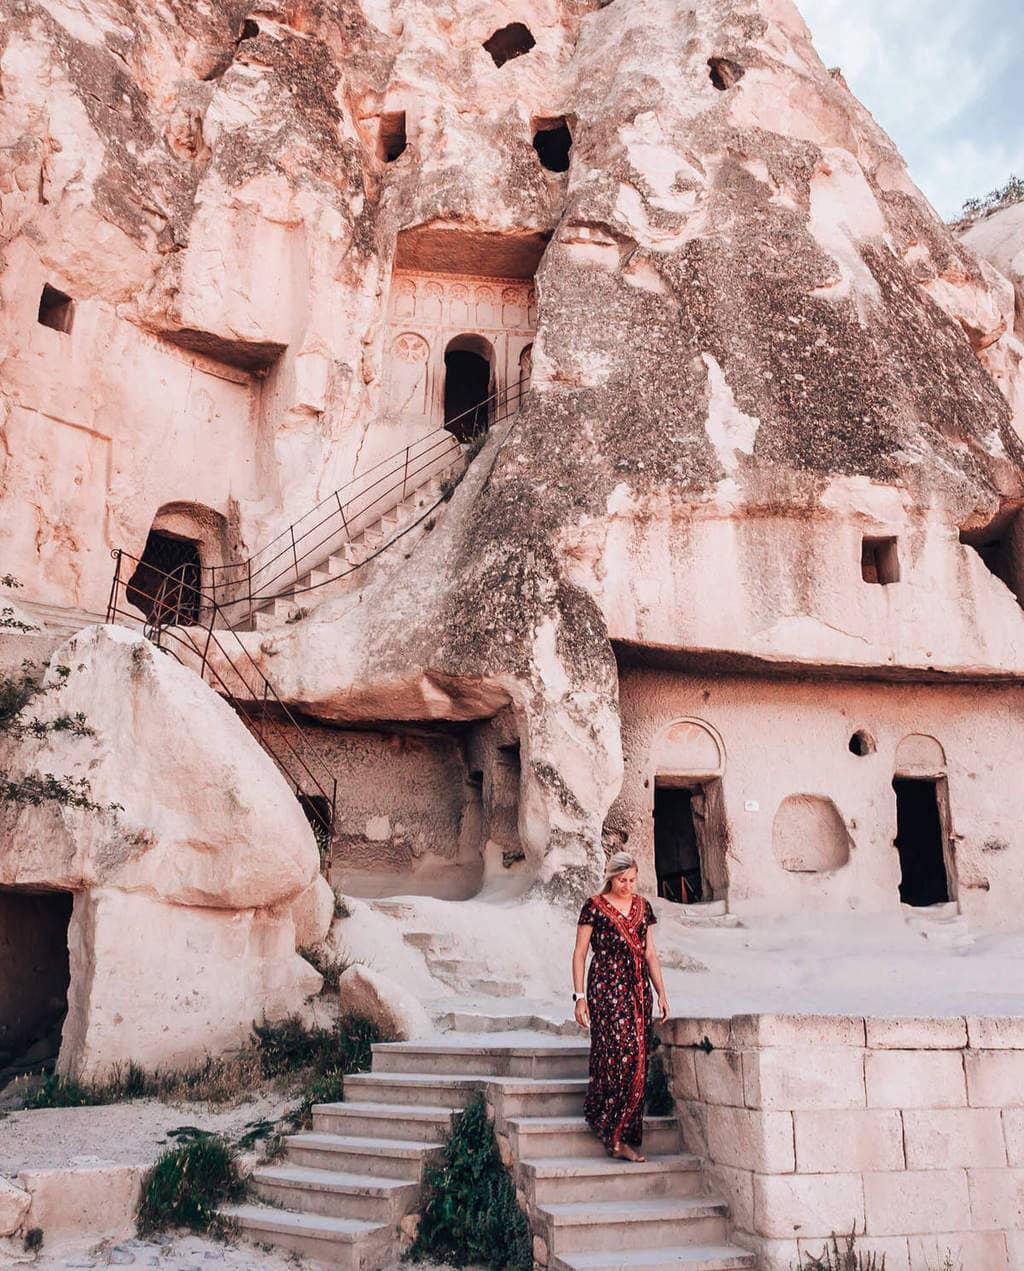 Cave church in Cappadocia Turkey